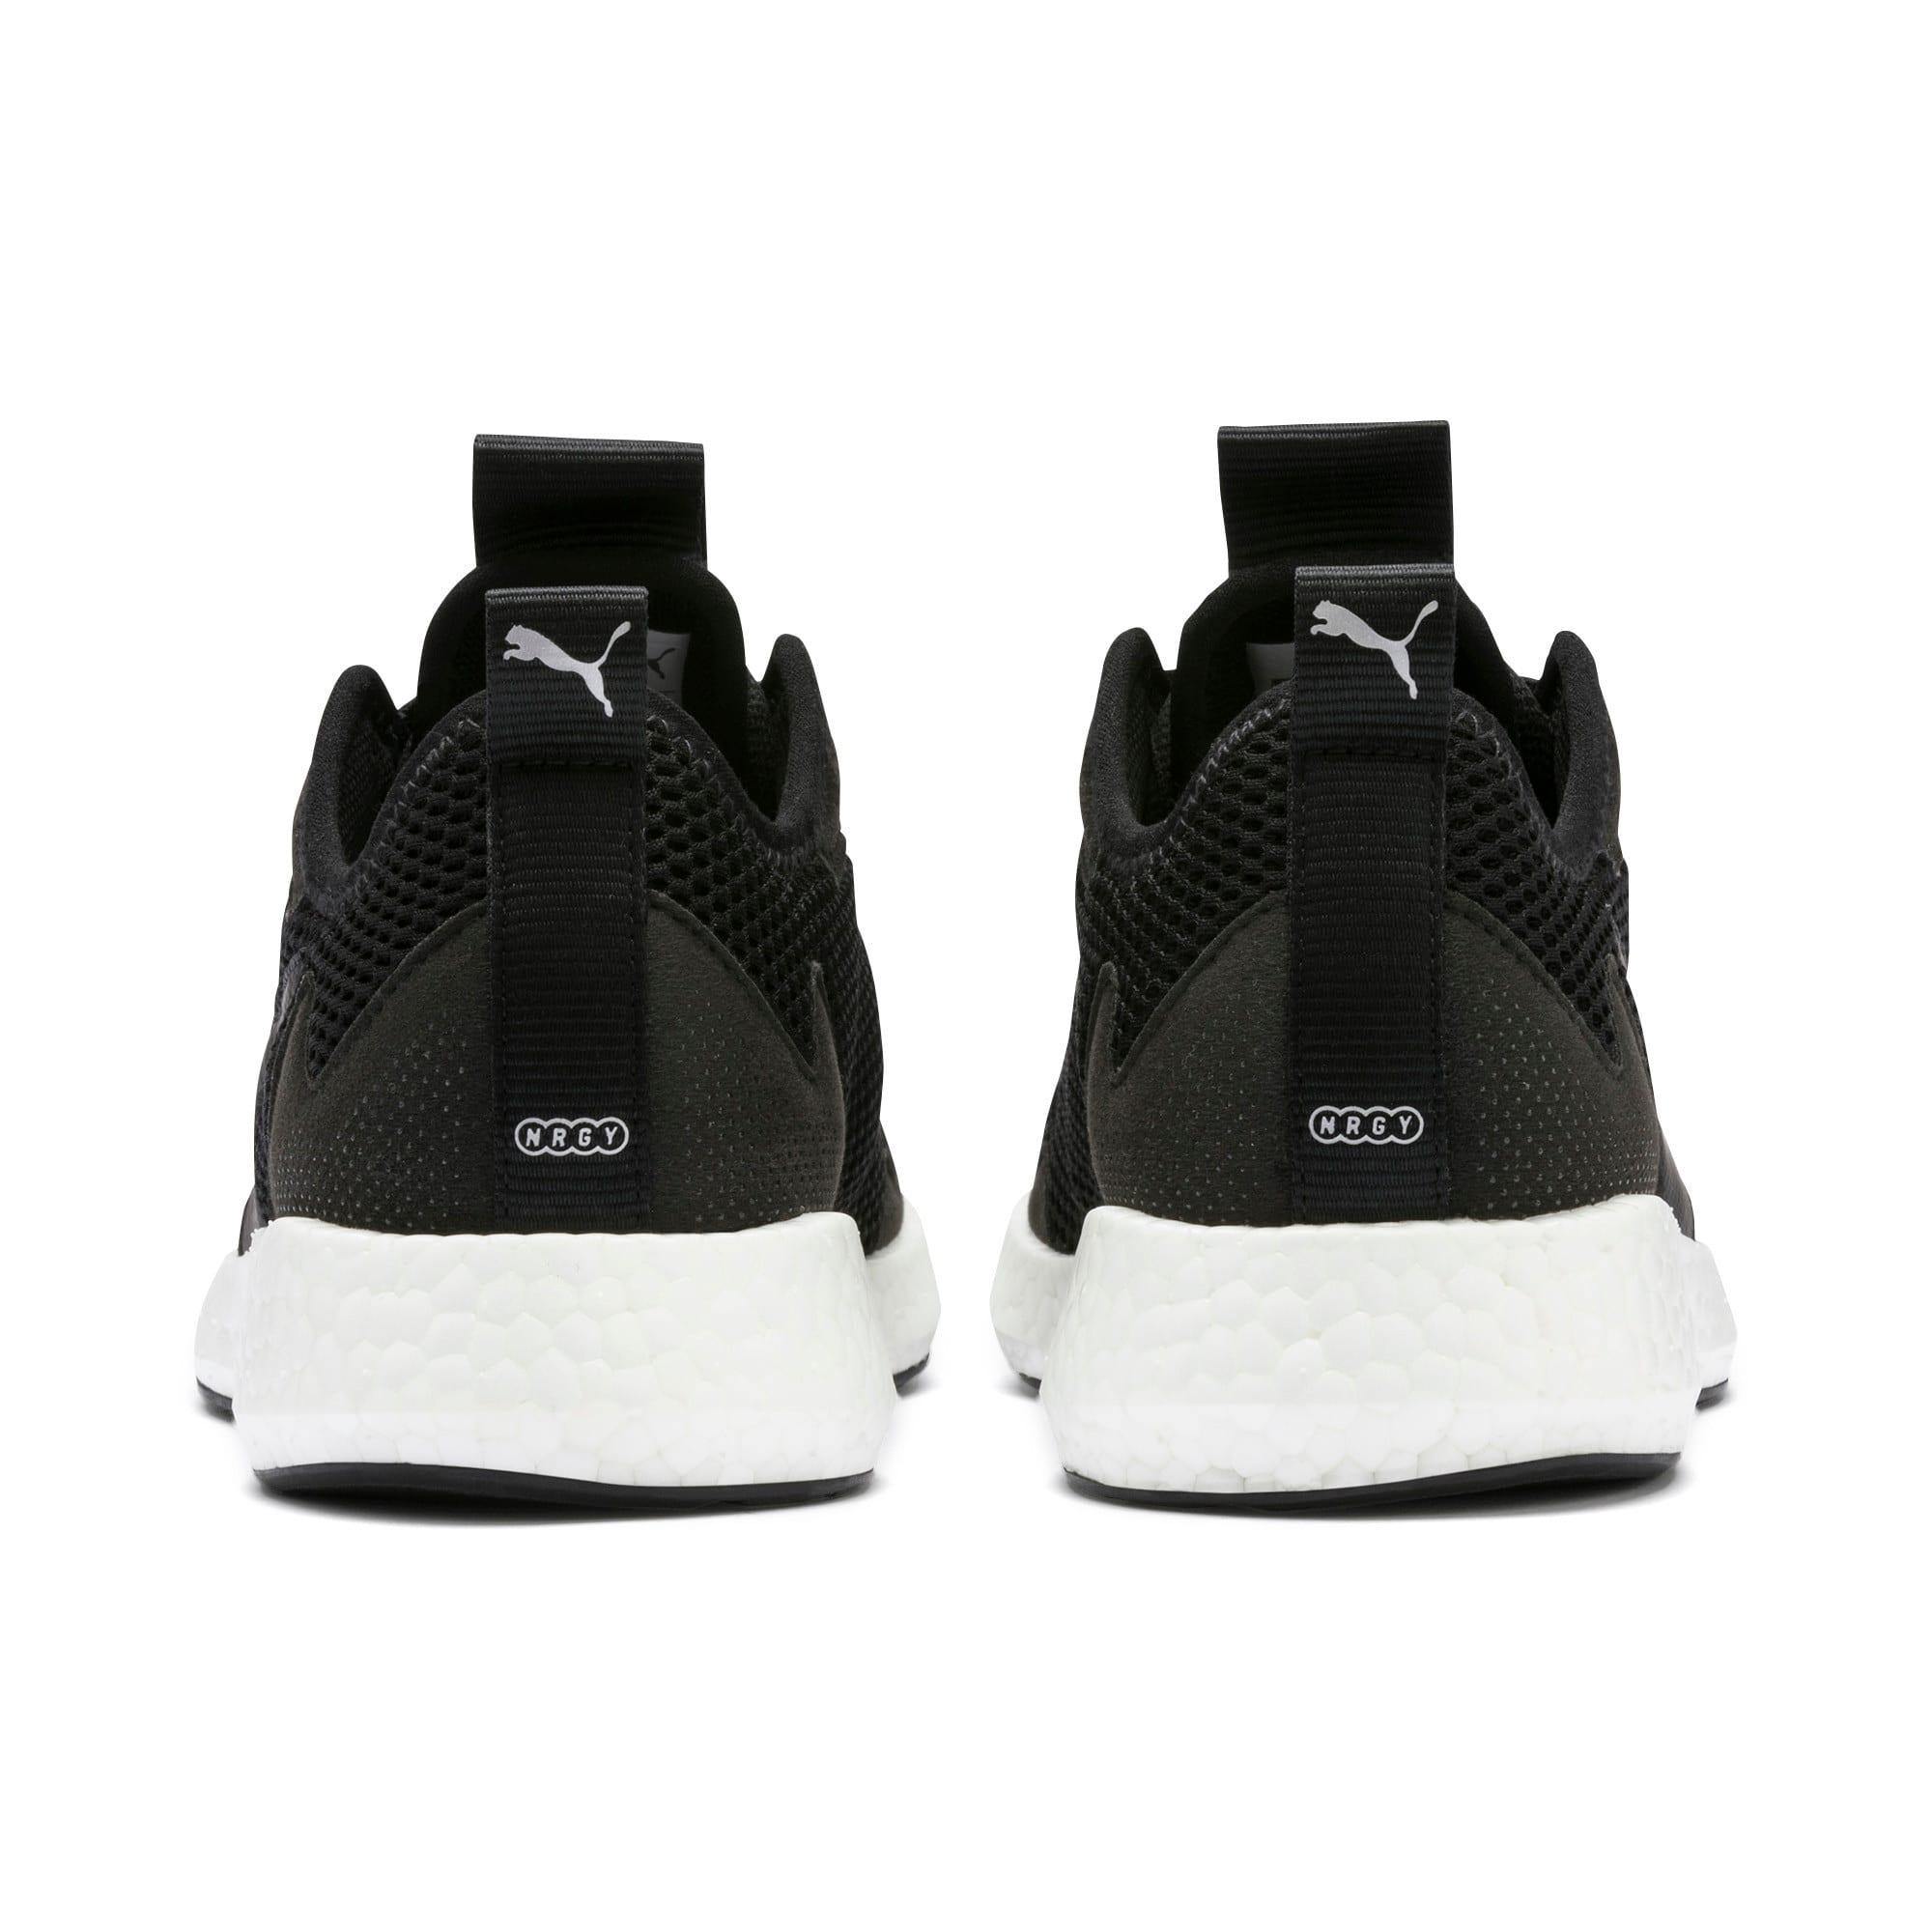 Thumbnail 4 of NRGY Neko Skim Women's Running Shoes, Puma Black-Puma Silver, medium